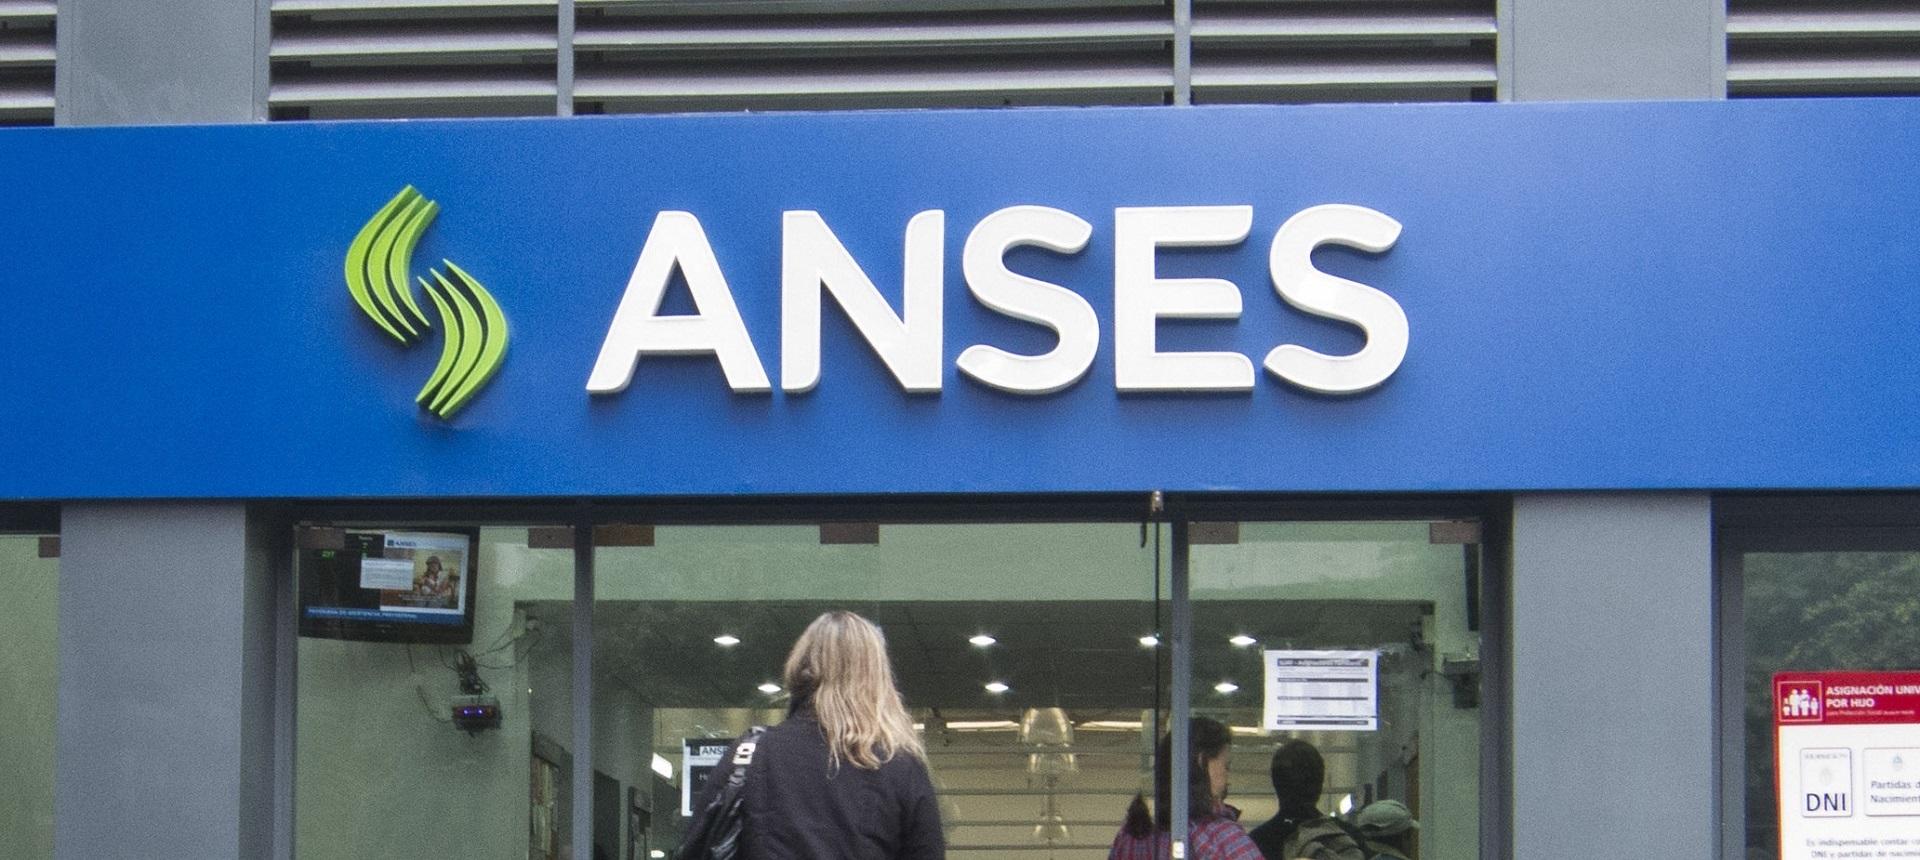 ANSES_2101